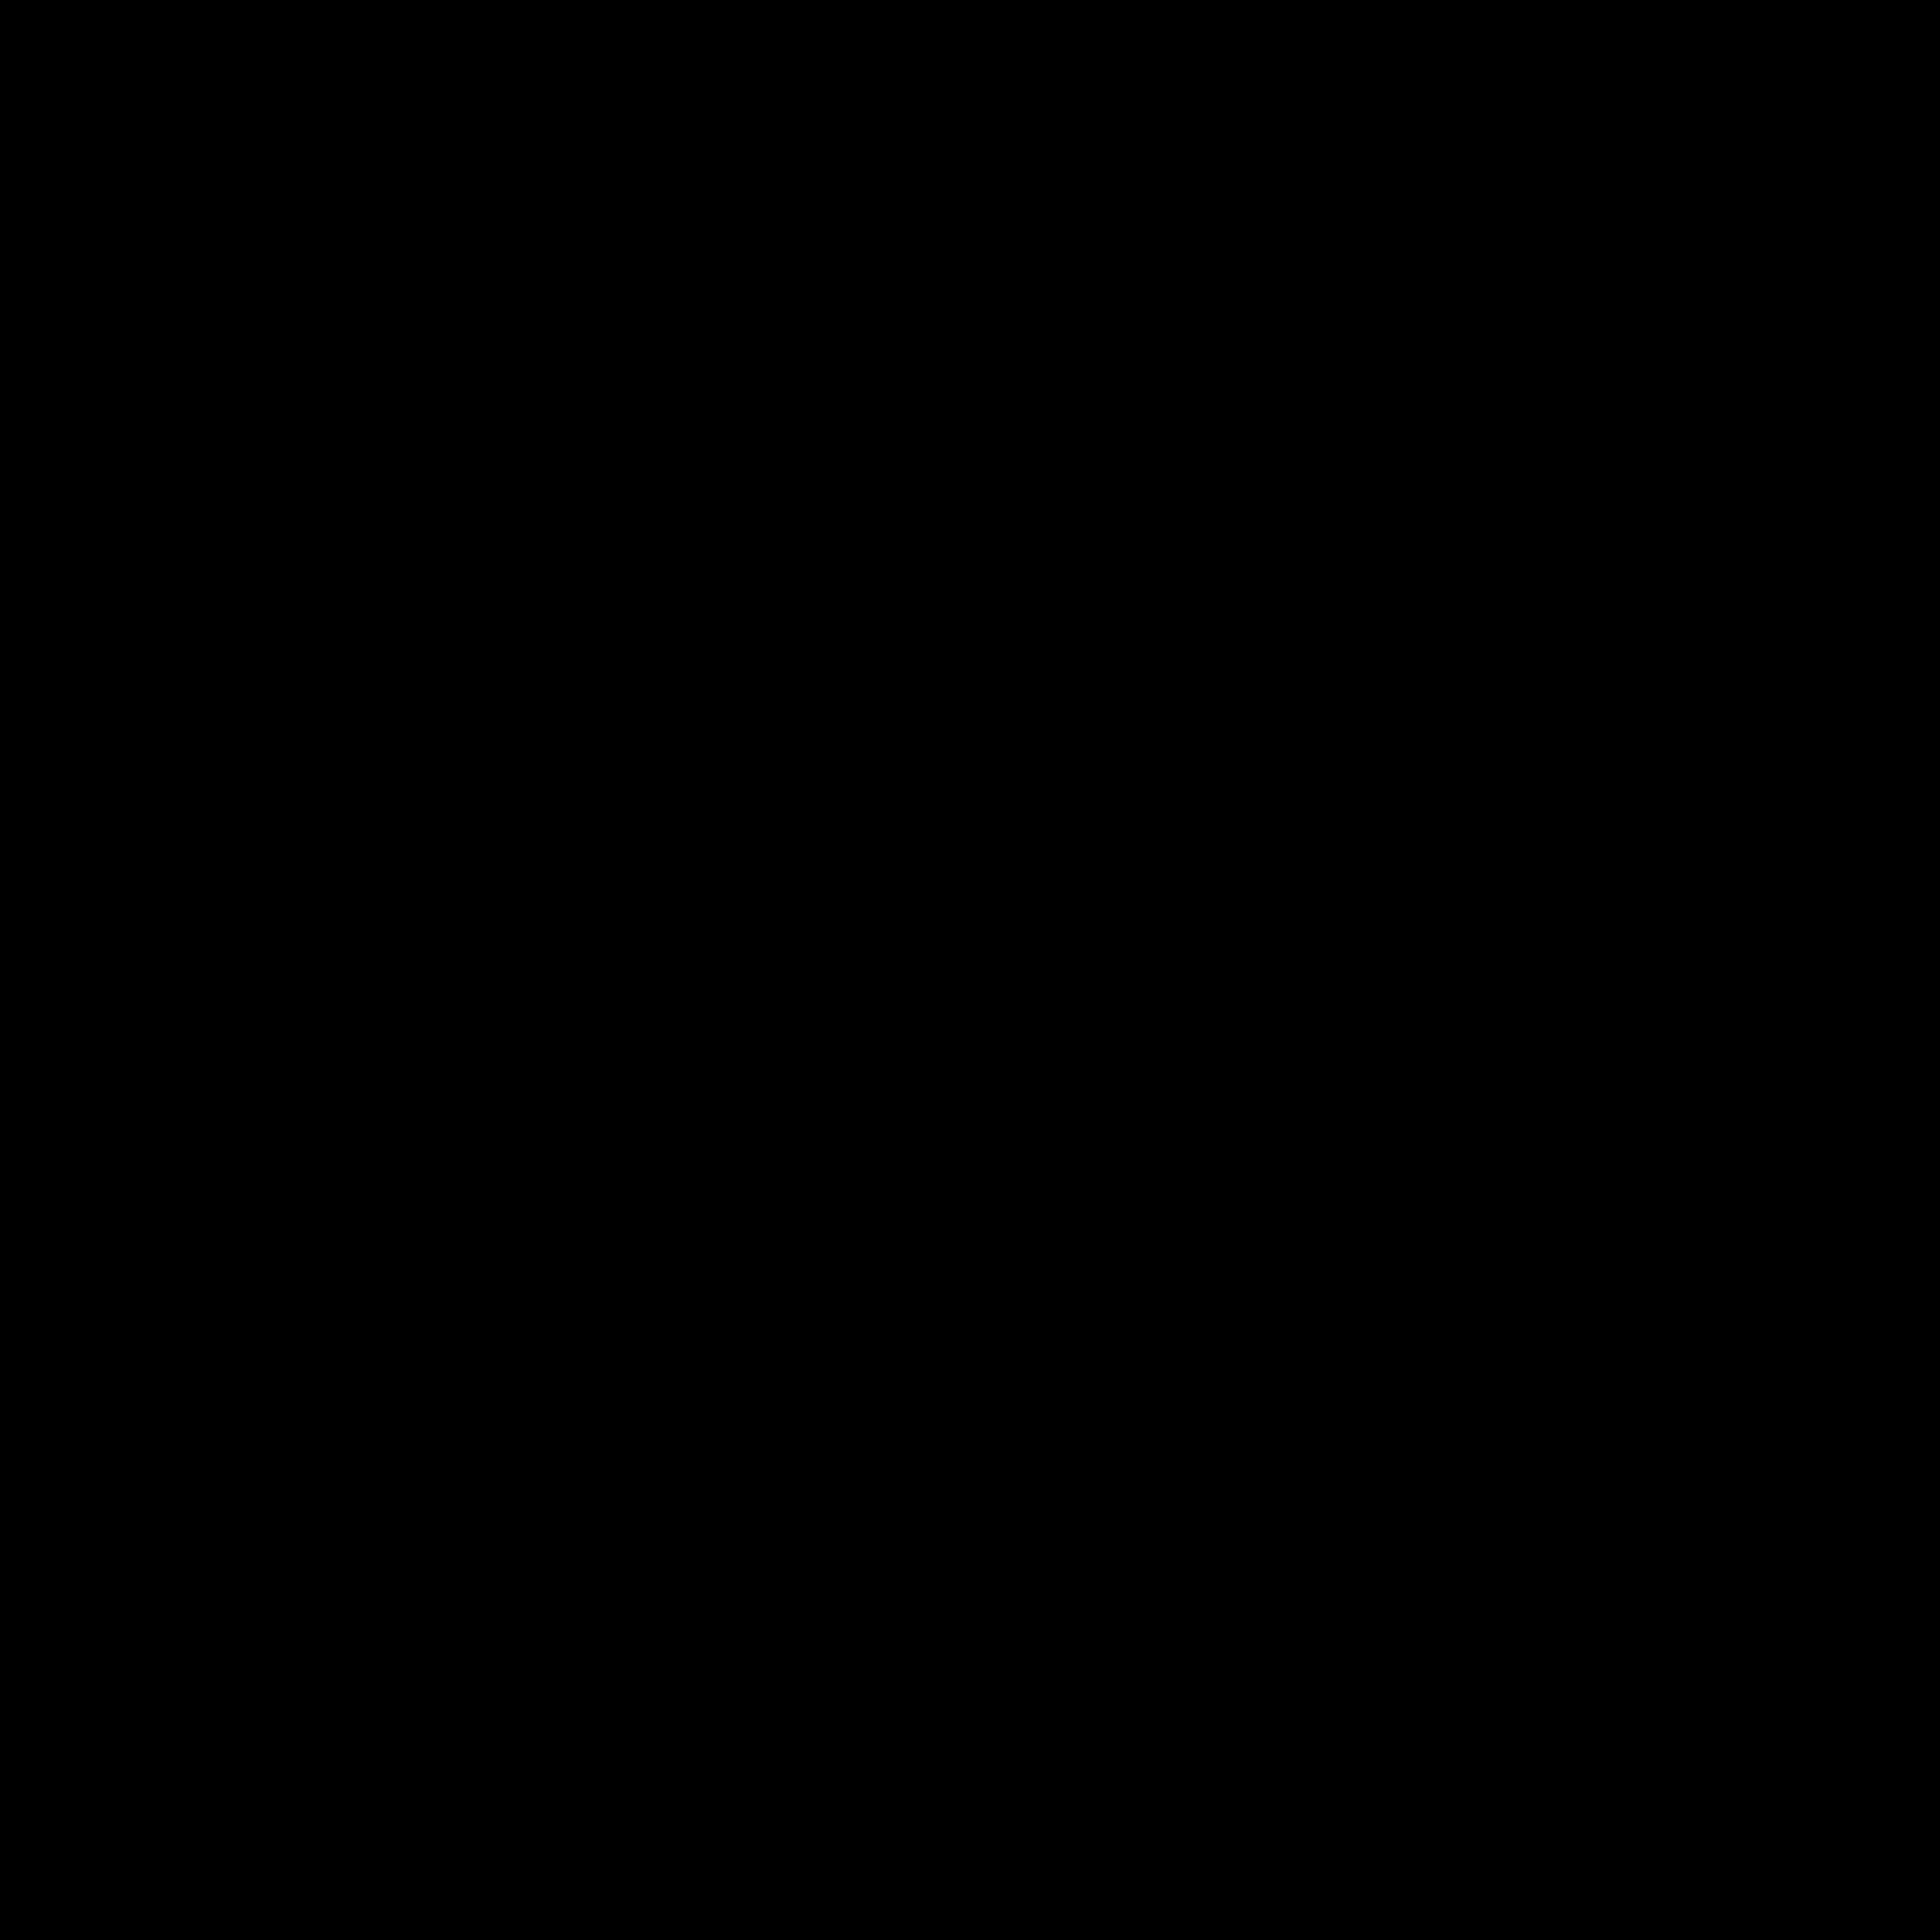 HC302 D FS Dimensions